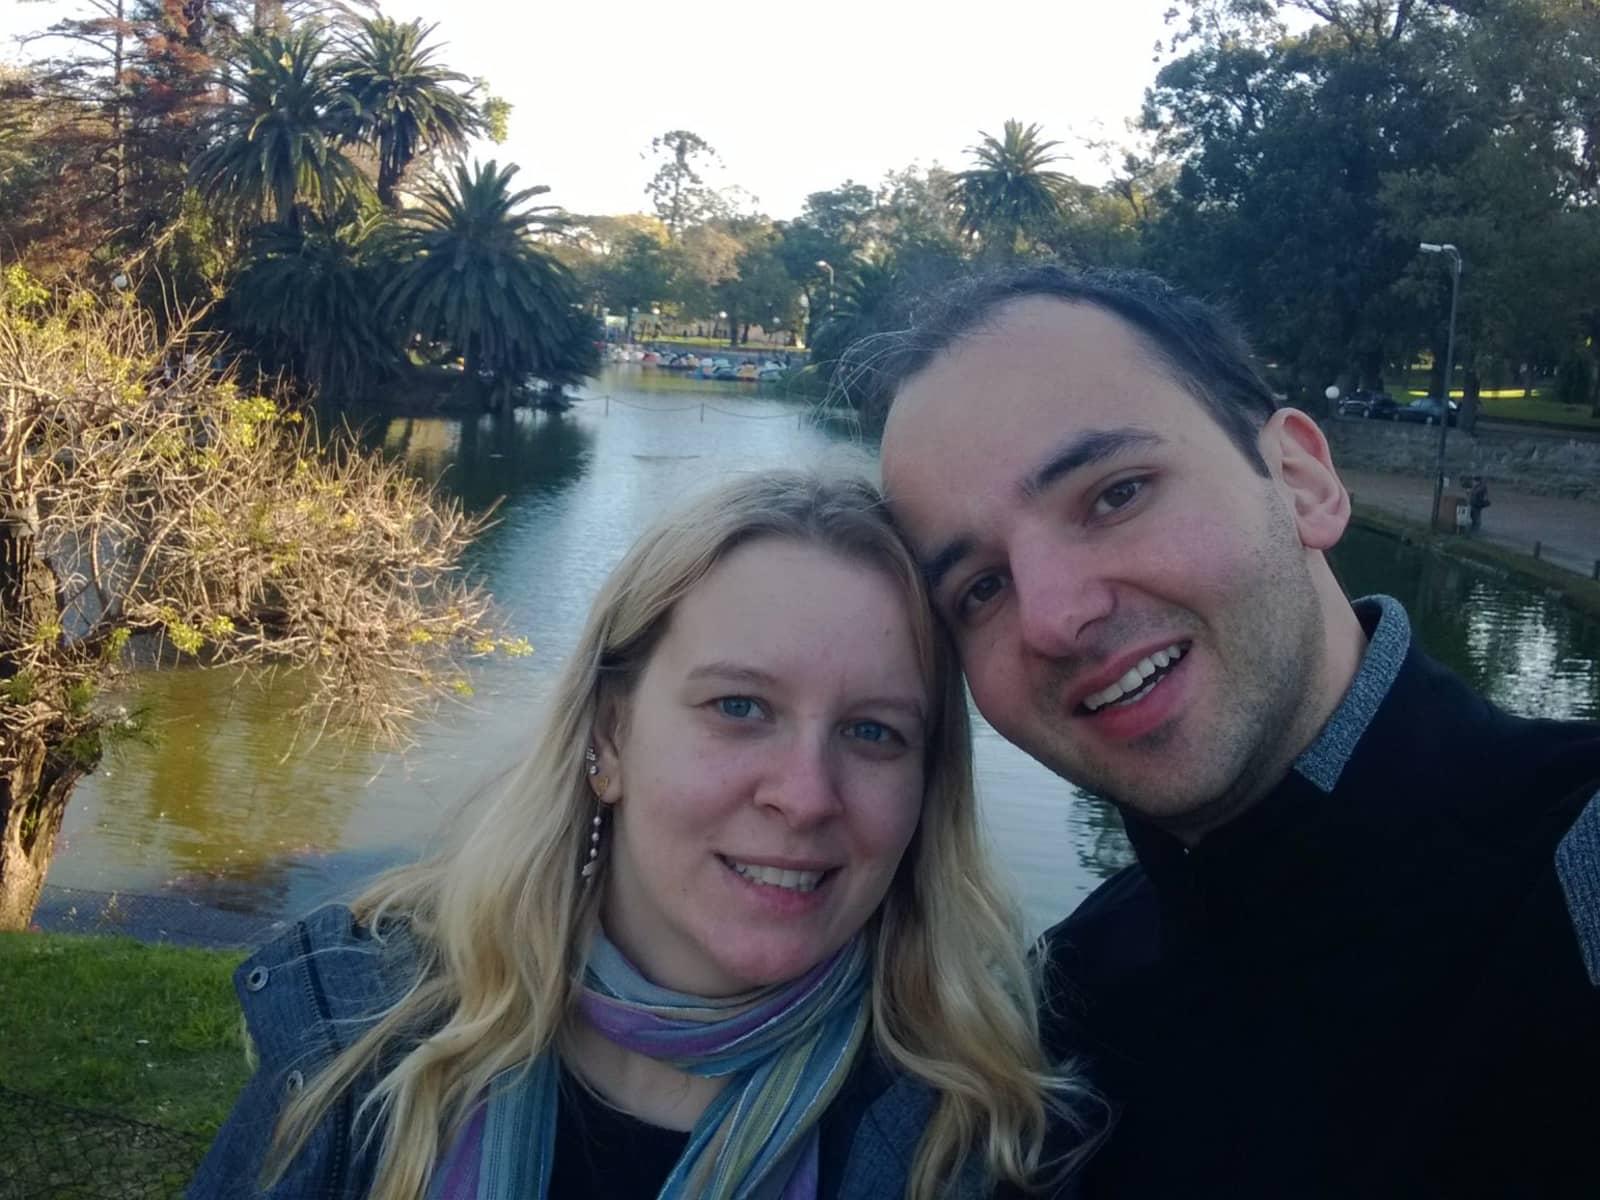 Luciana & Matheus gustavo from Porto Alegre, Brazil